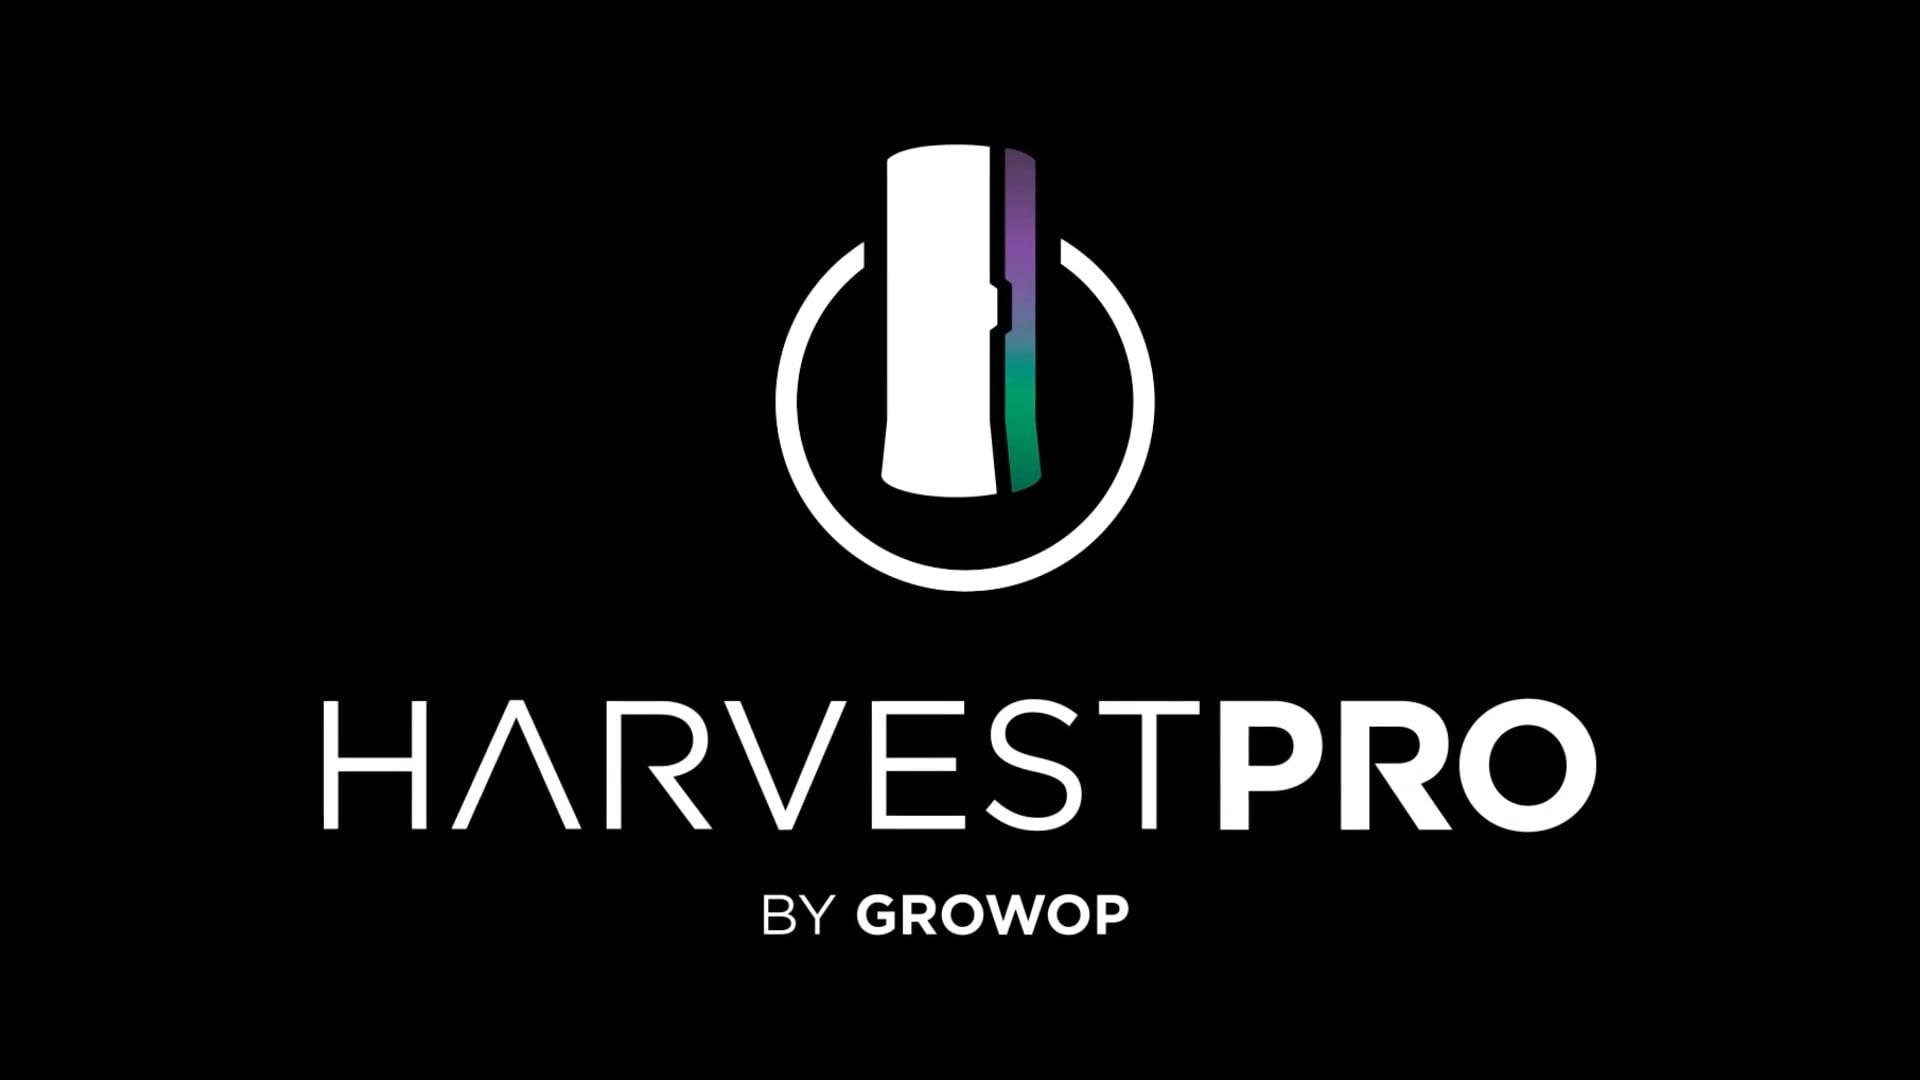 Harvest Pro - Explainer Video